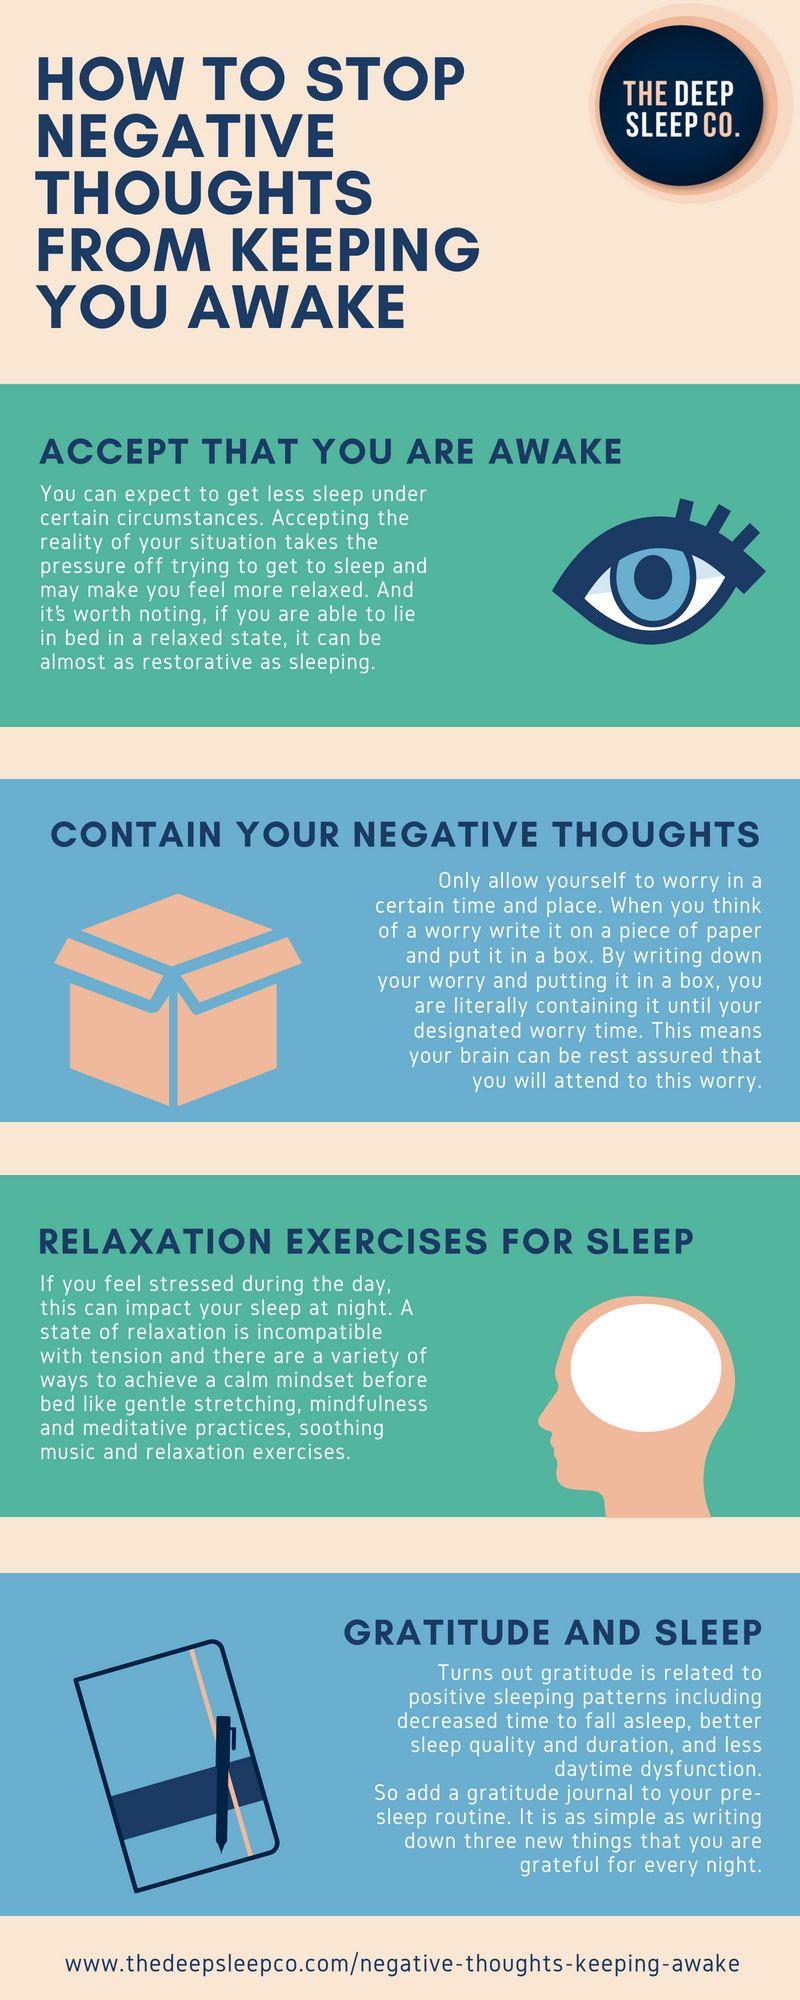 Stay Awake for Mental Health Benefits advise